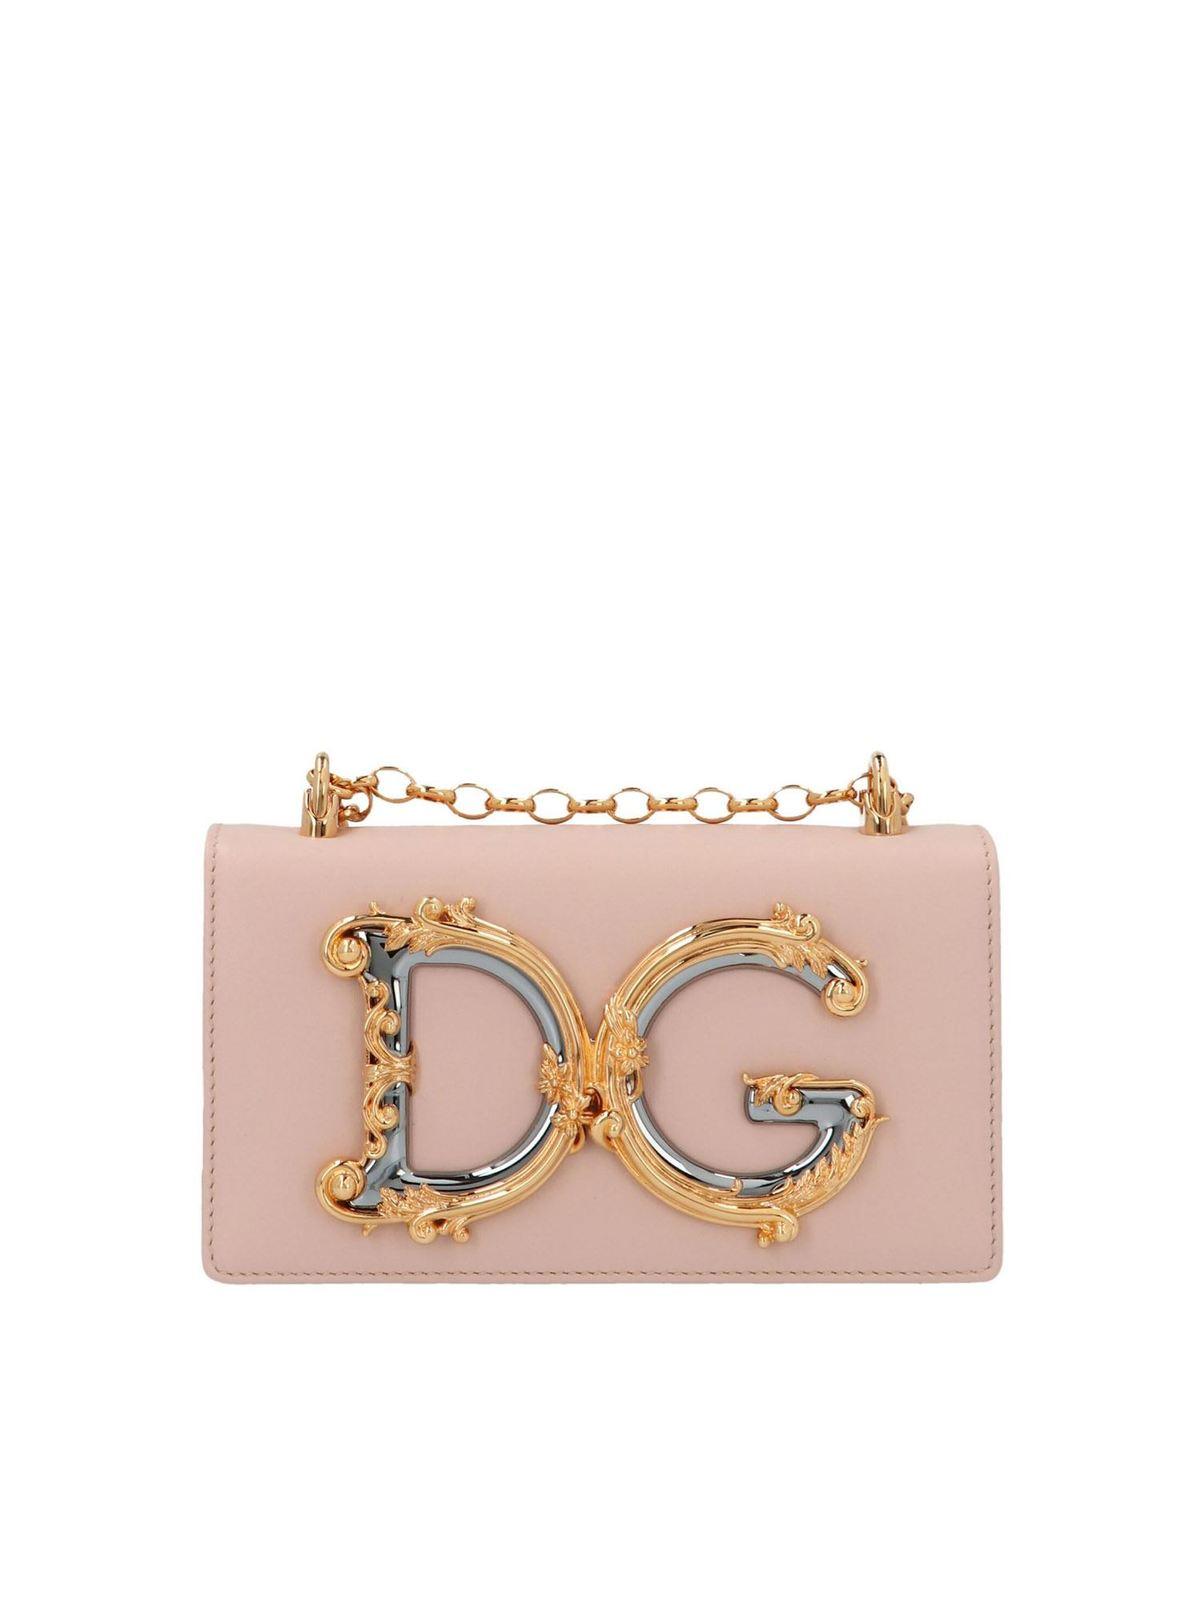 Dolce & Gabbana Bags DG MINI CROSSBODY BAG IN PINK